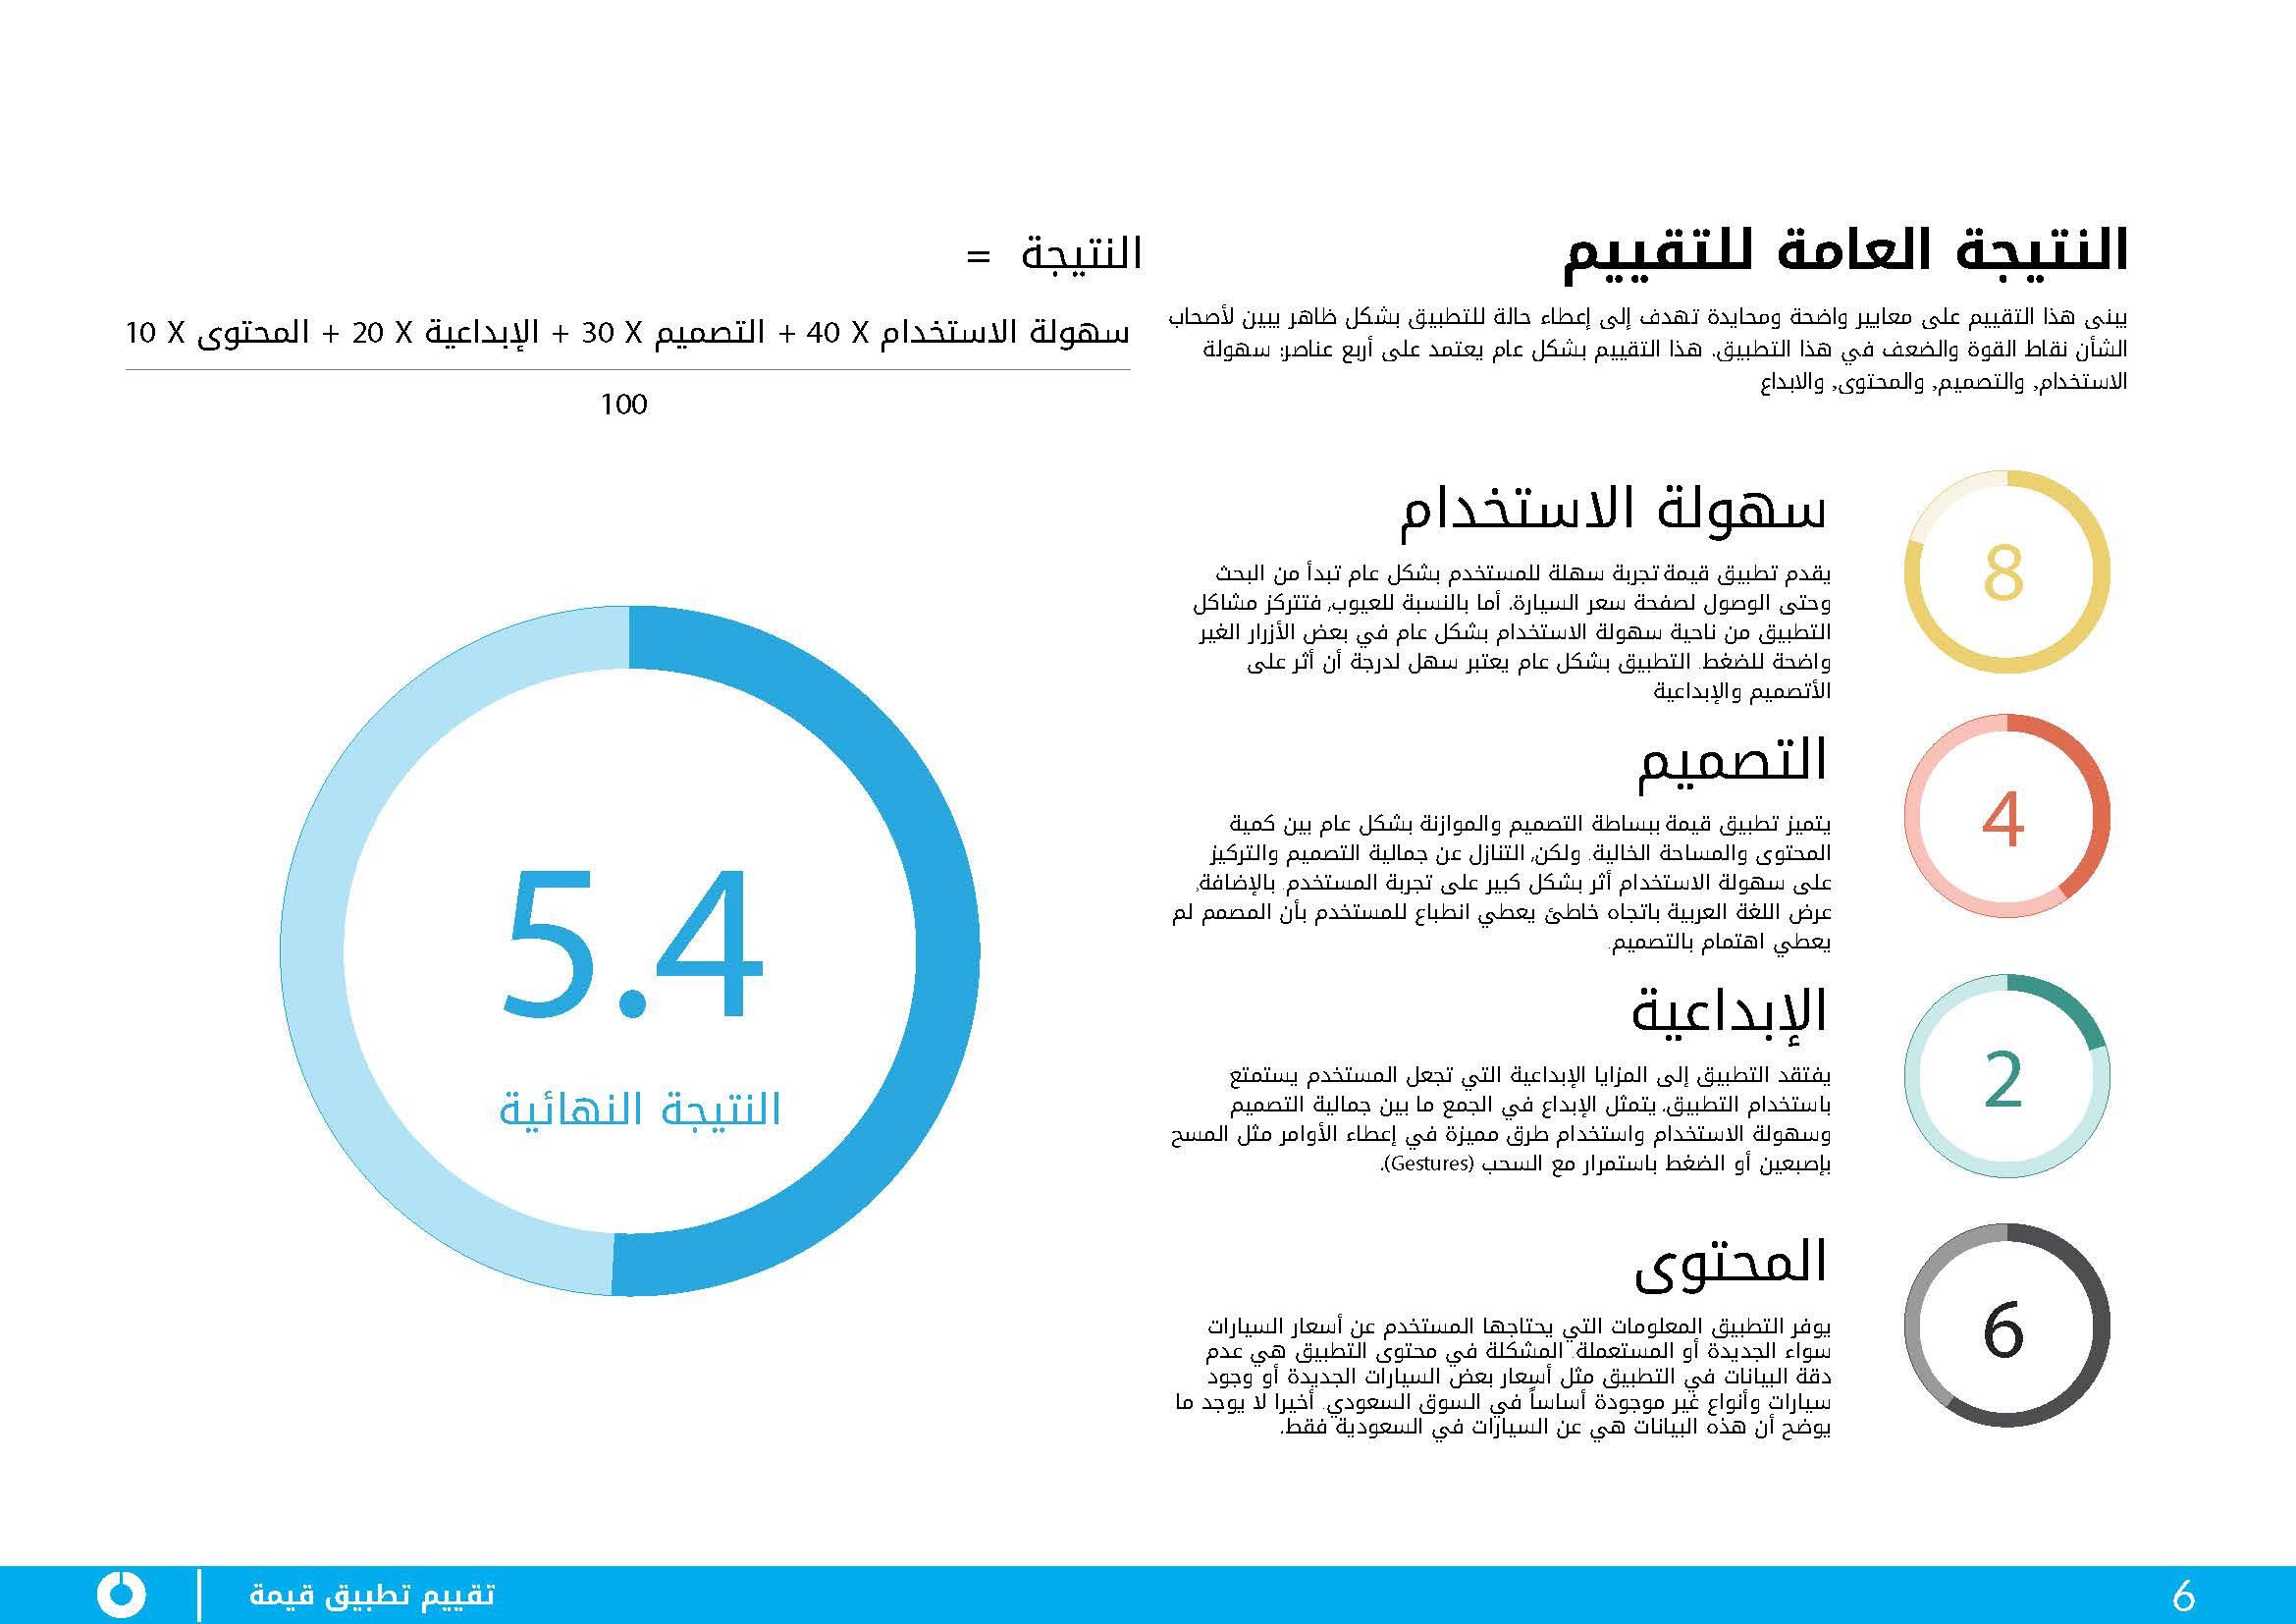 Result-Final UX Evaluation Report for Qima App-2.jpg